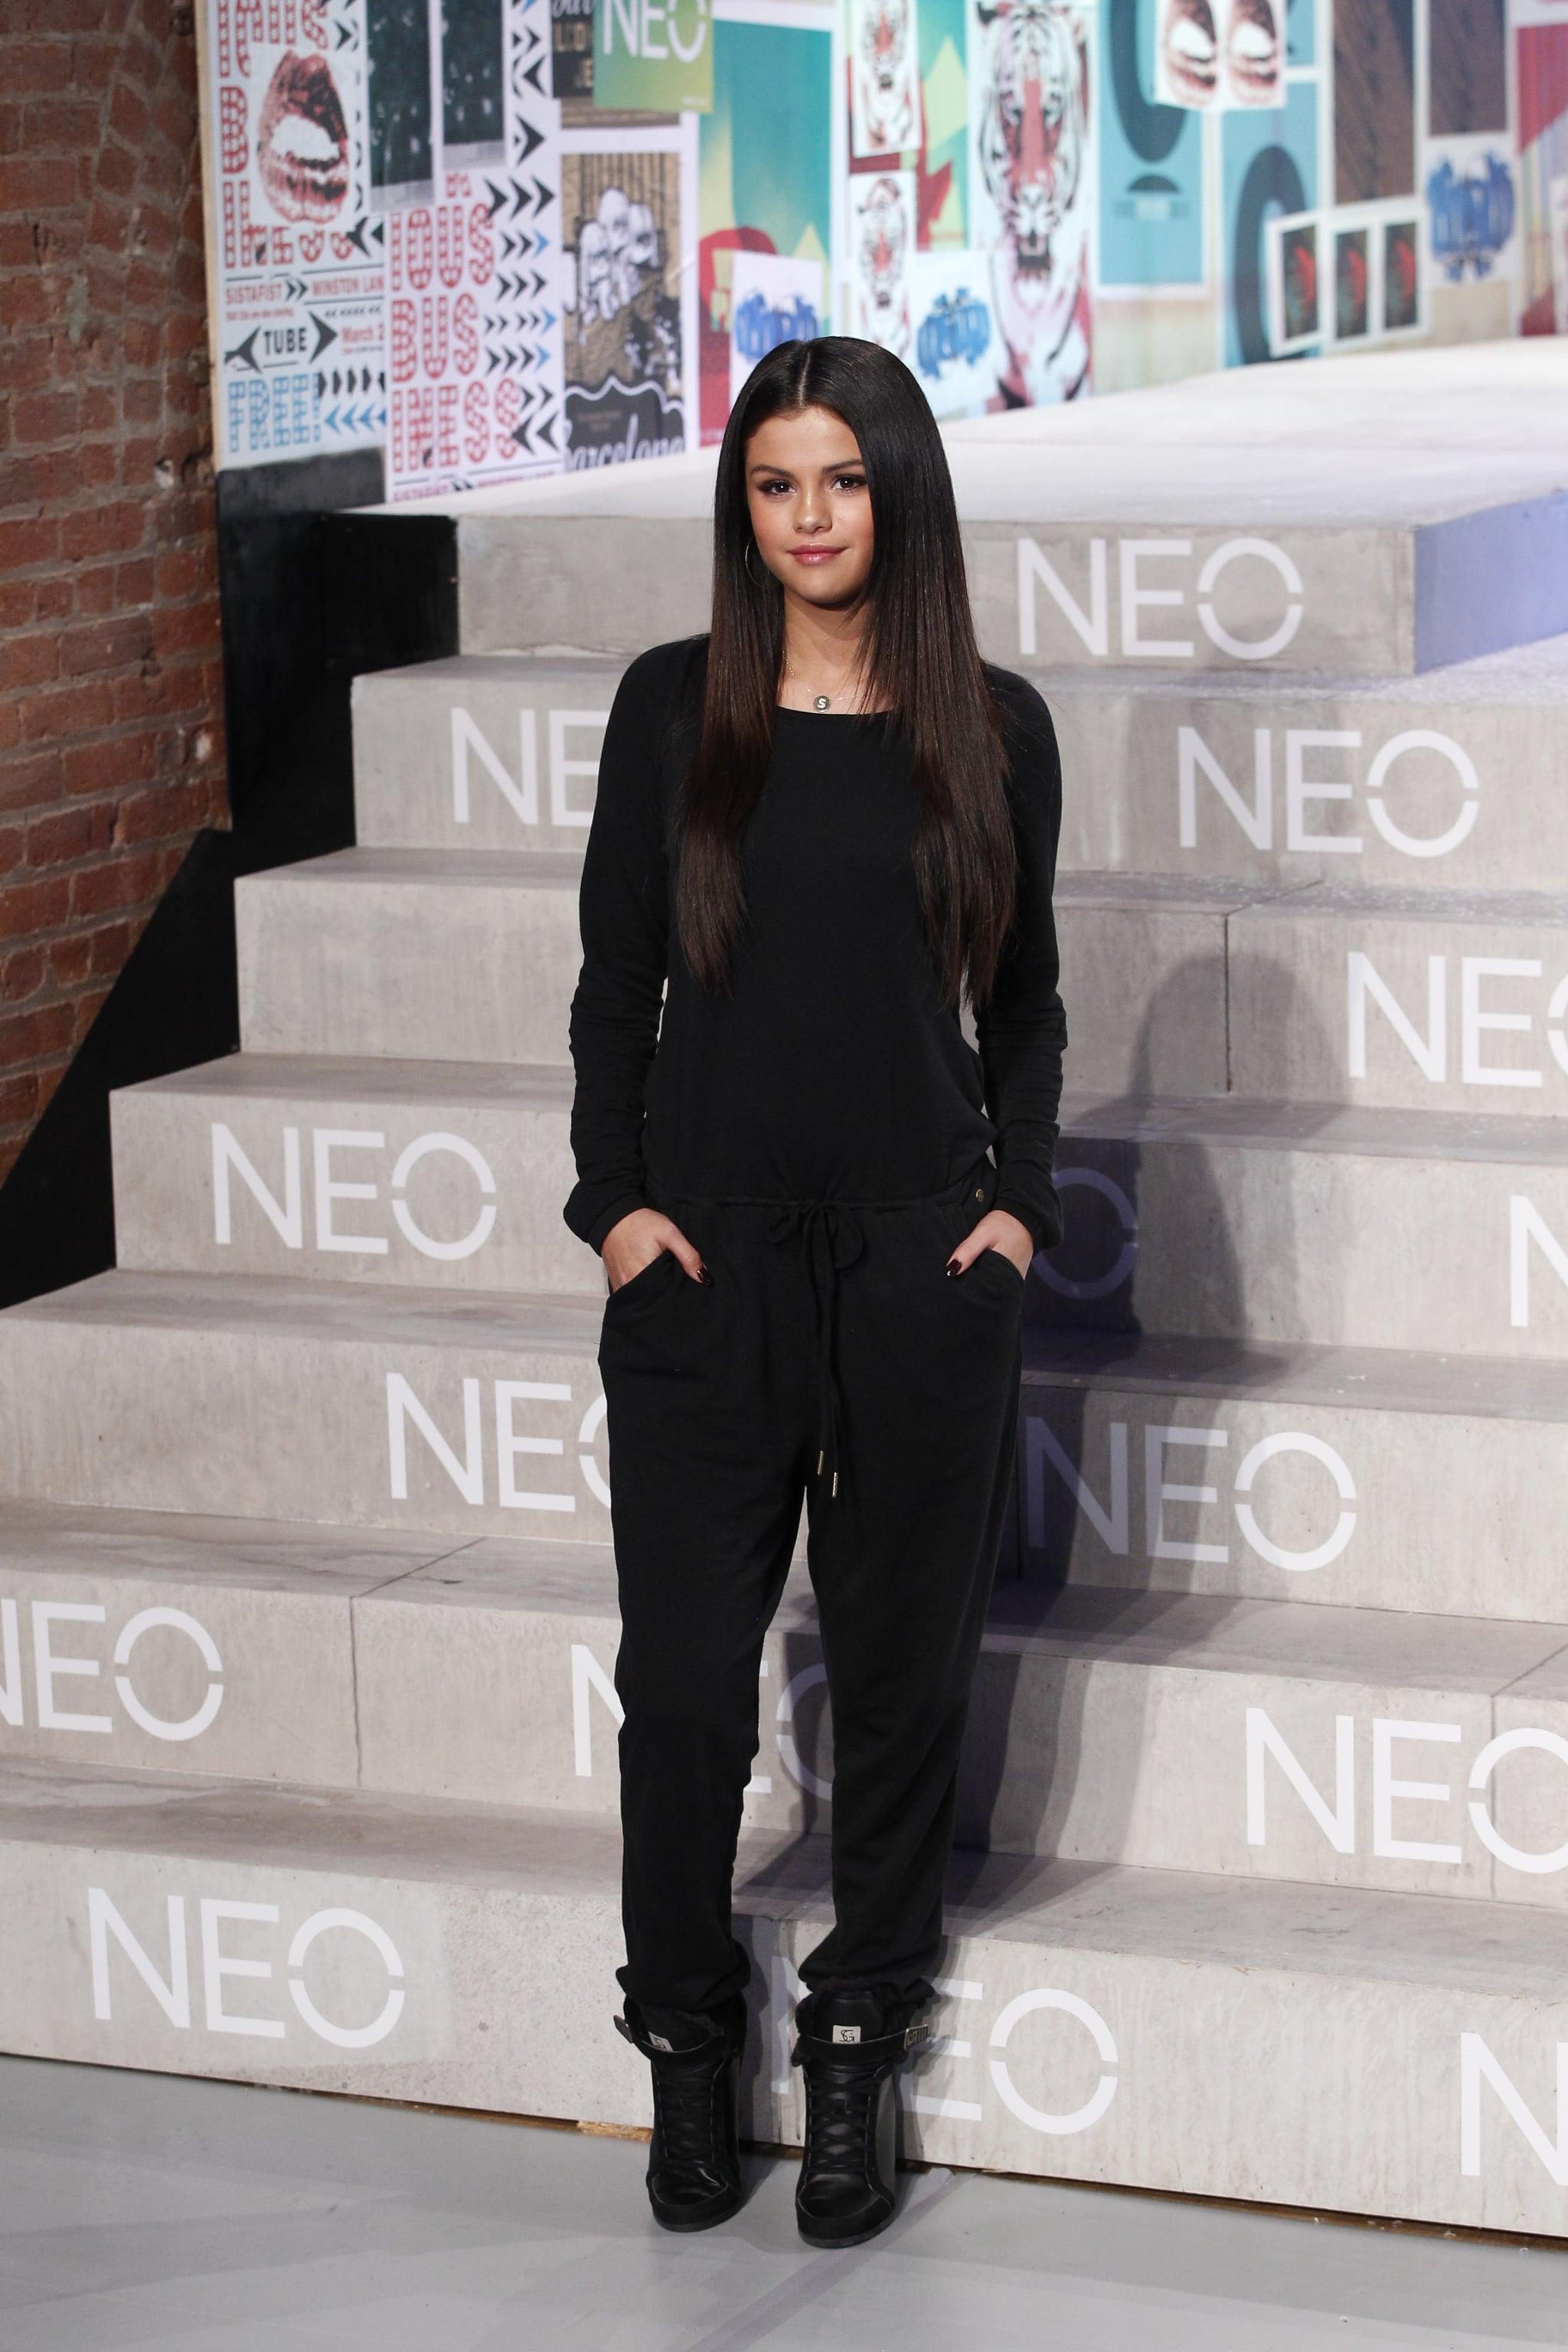 Selena Gomez Adidas NEO Collection | POPSUGAR Fashion